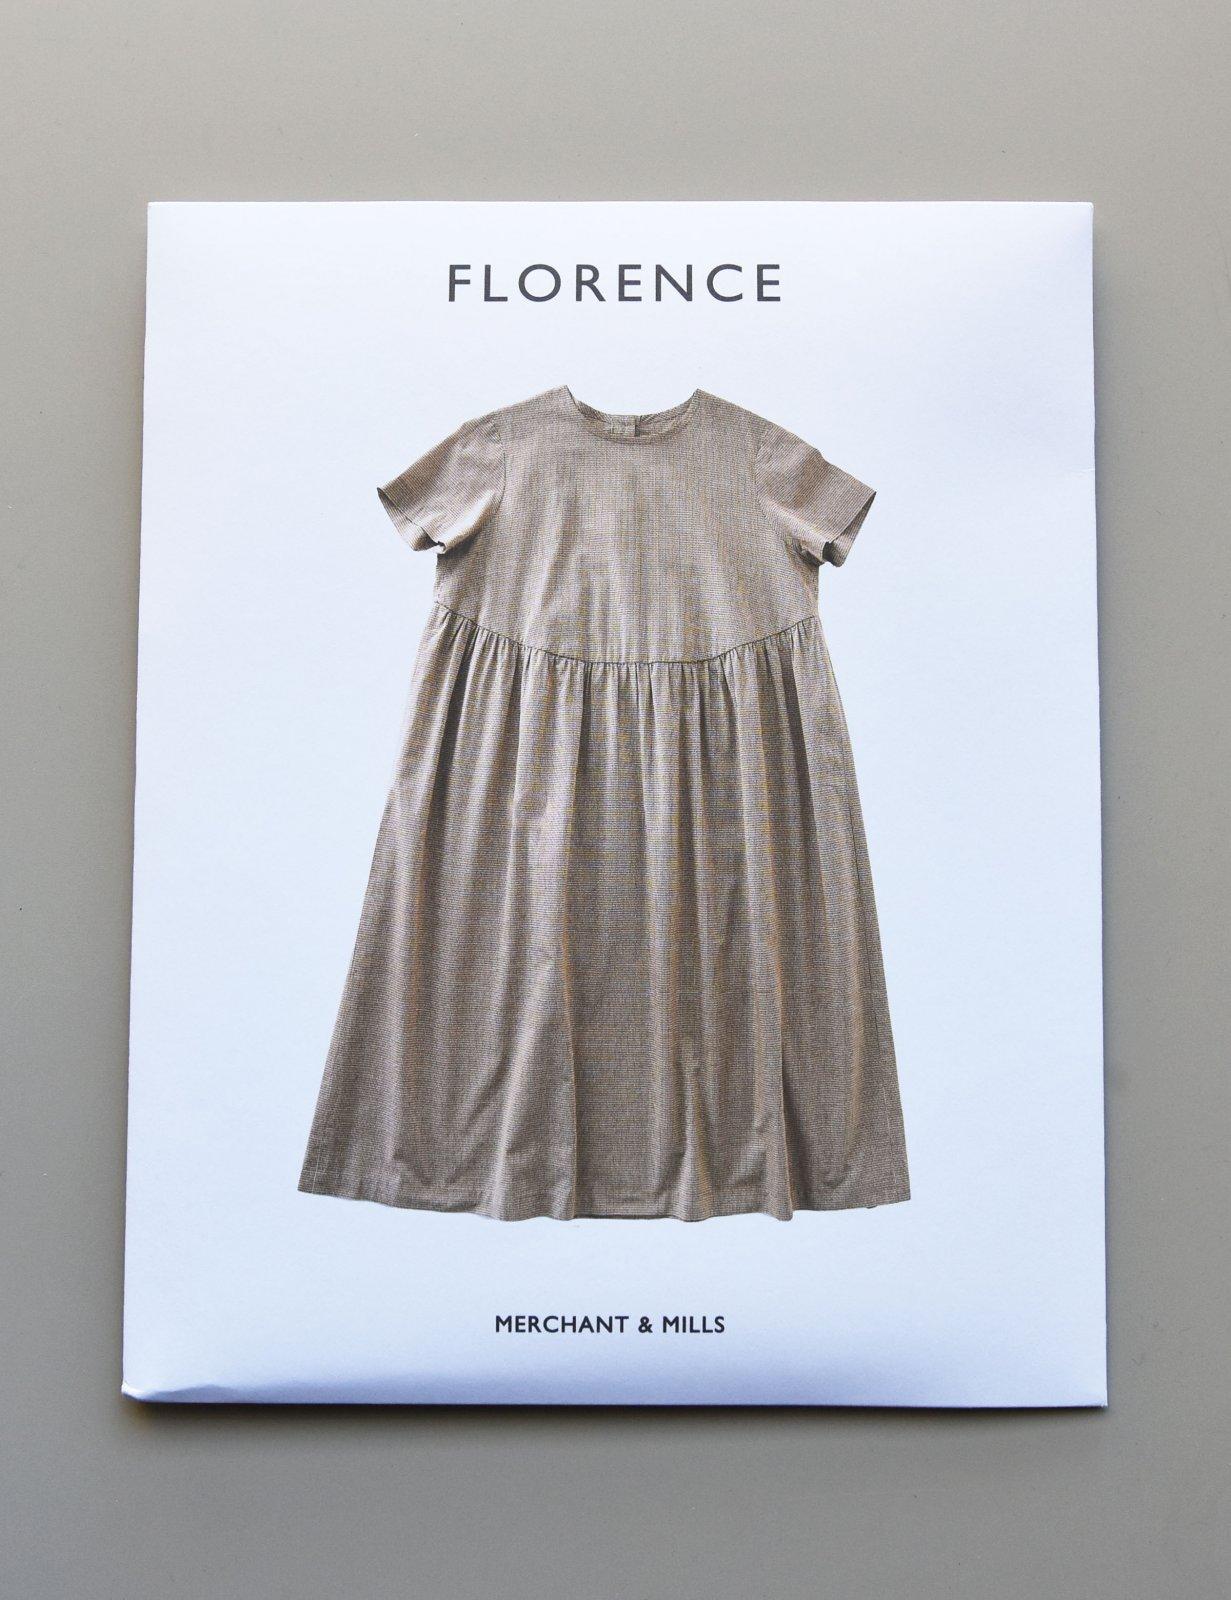 Merchant & Mills - The Florence Pattern